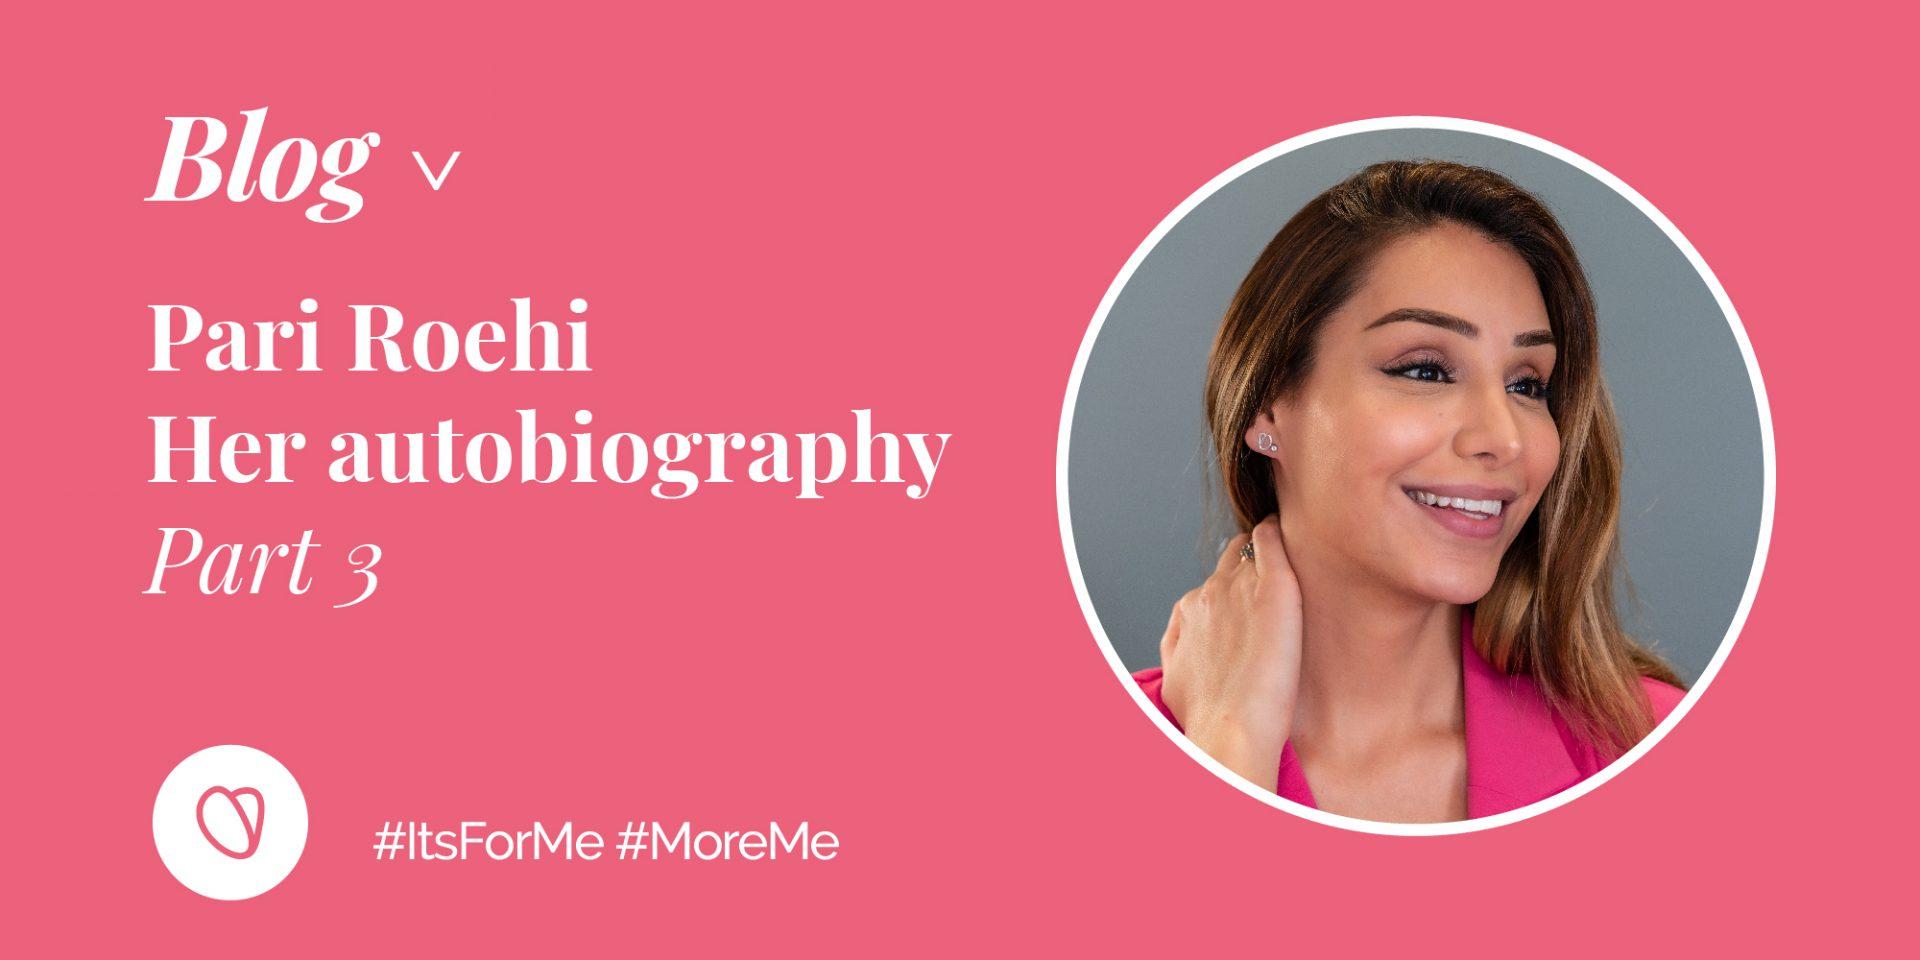 Pari Roehi's story – Part 3